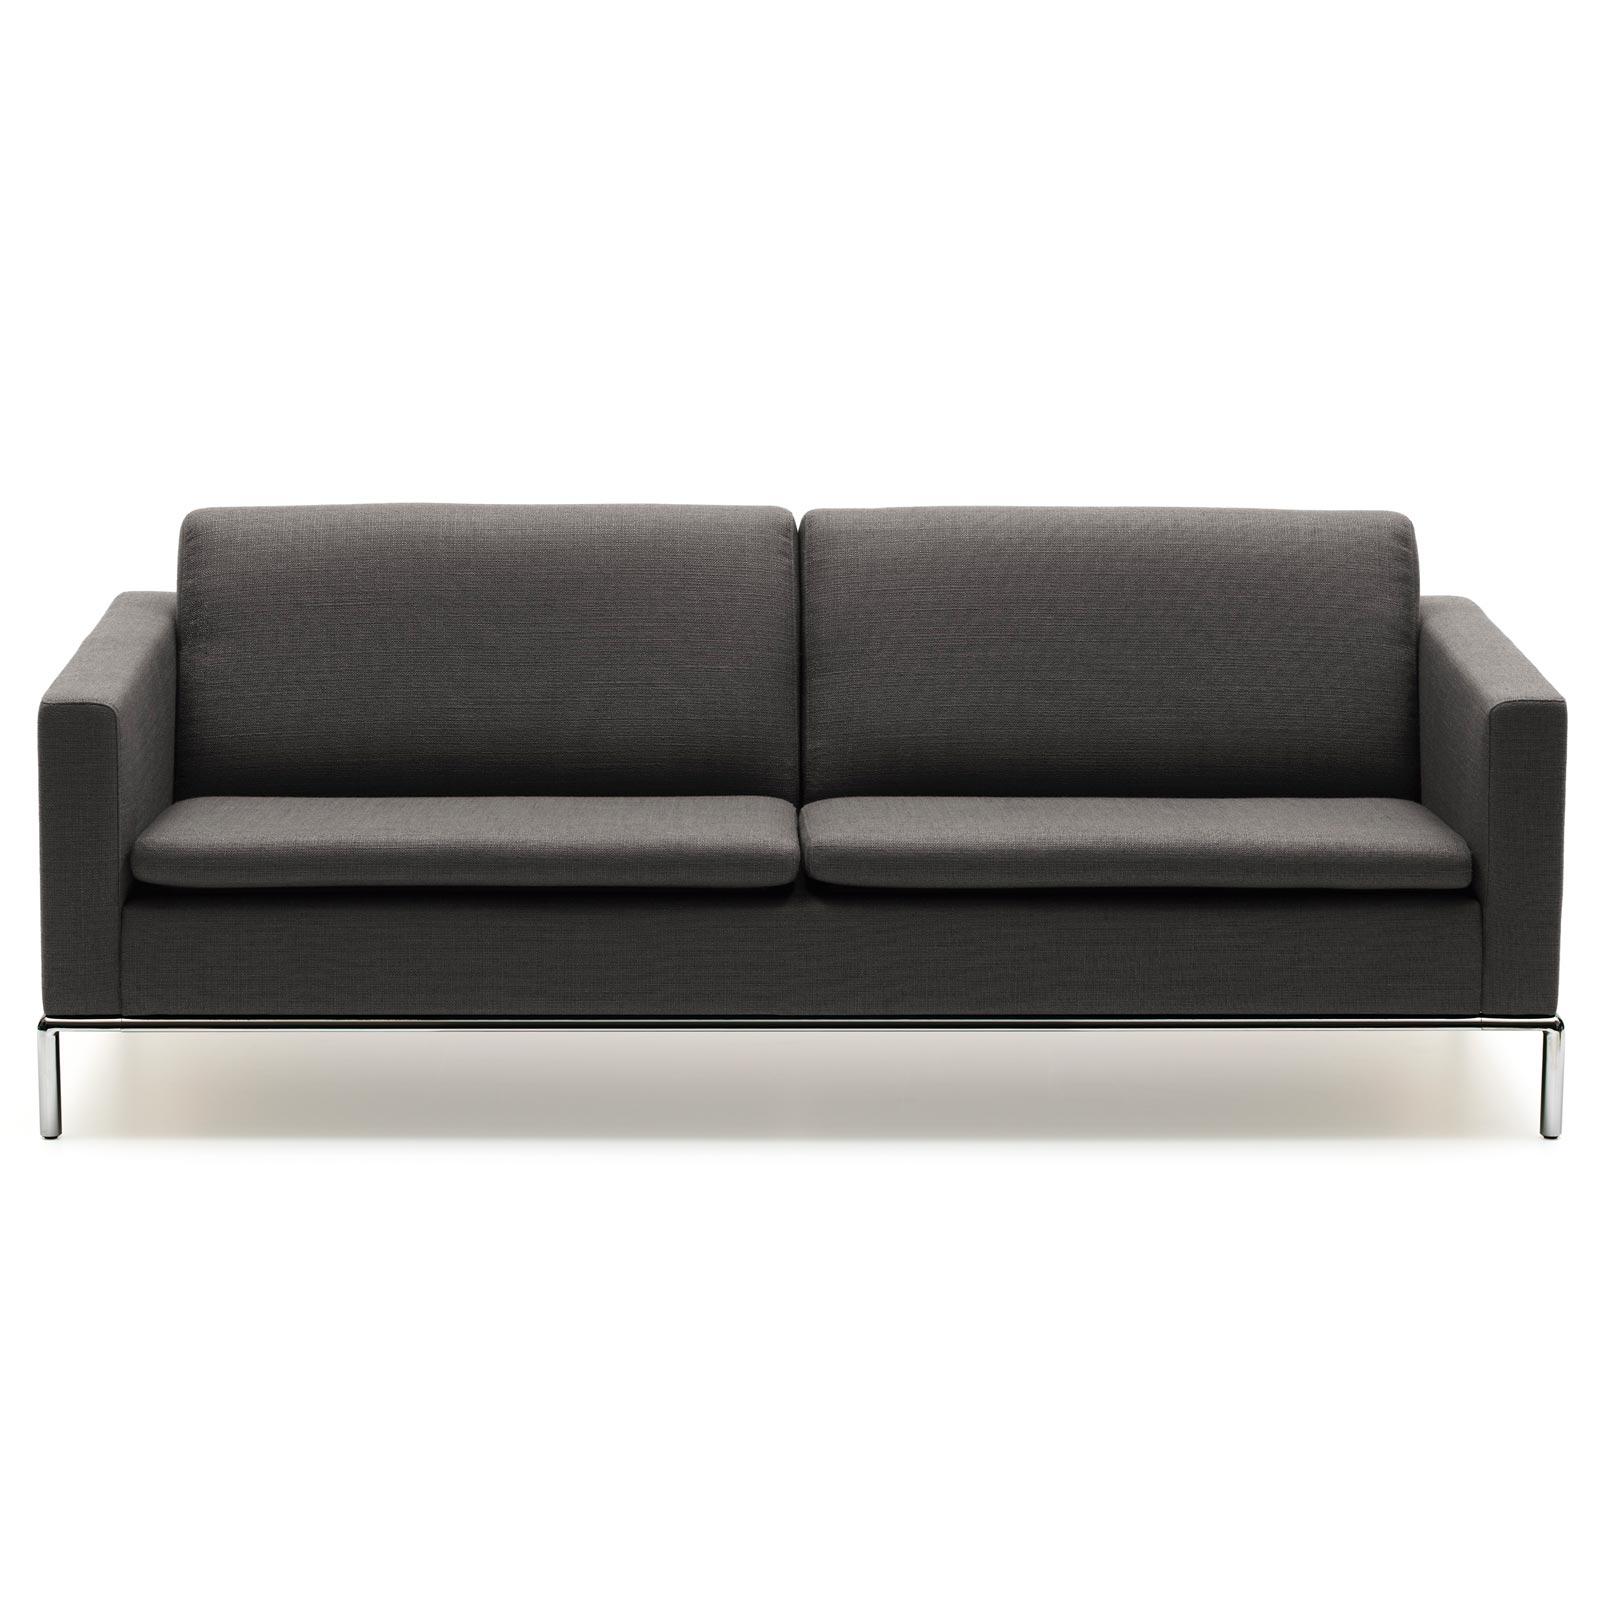 Full Size of De Sede Sofa Leder Gebraucht Furniture Uk Sessel Usa Outlet Preisliste Bed Kaufen Ds 600 Schweiz For Sale Preise Couch 4 Von Schlafzimmer Kommode Rundes Bett Sofa De Sede Sofa